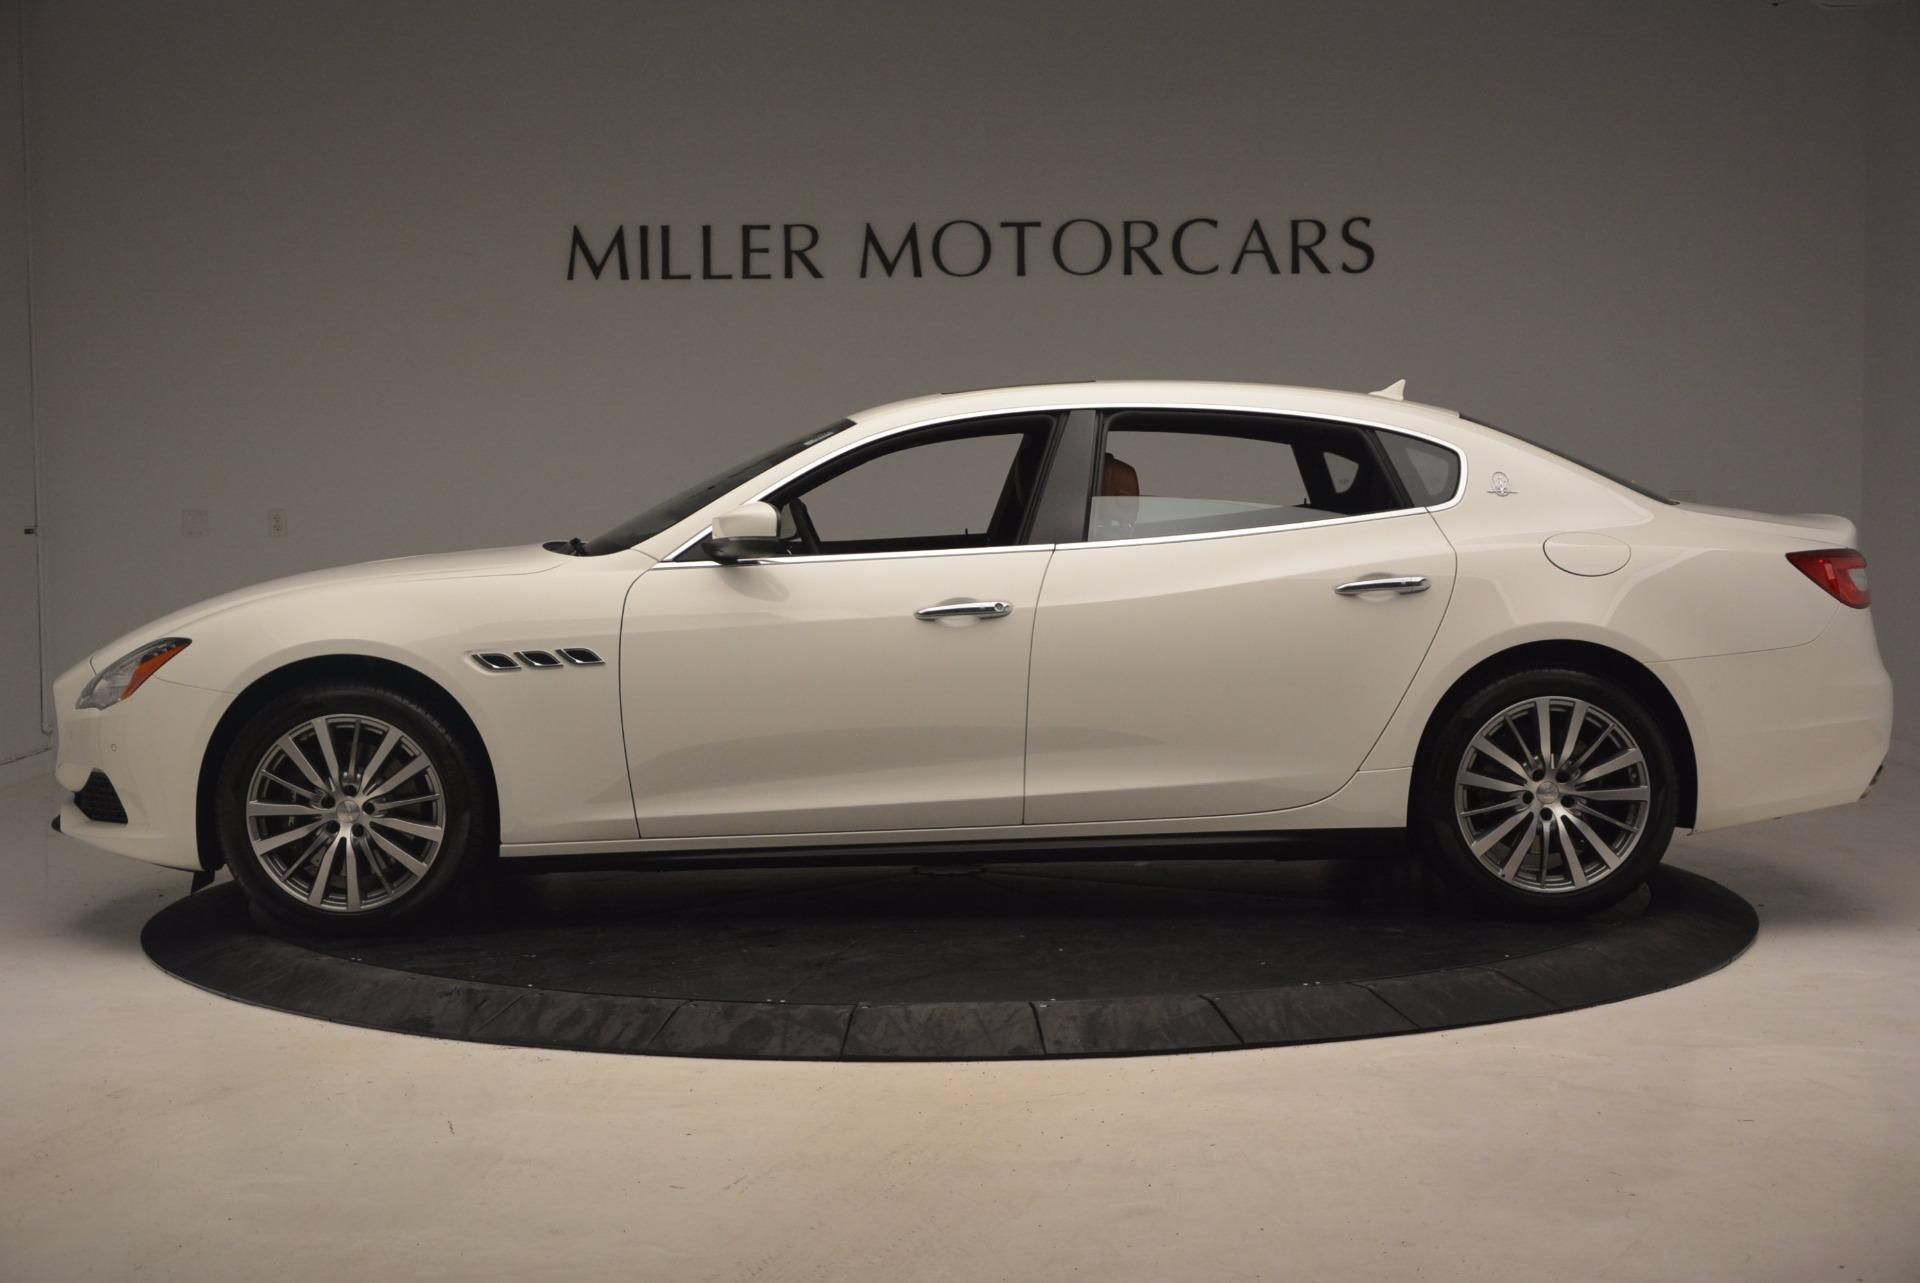 New 2017 Maserati Quattroporte SQ4 For Sale In Westport, CT 1065_p3